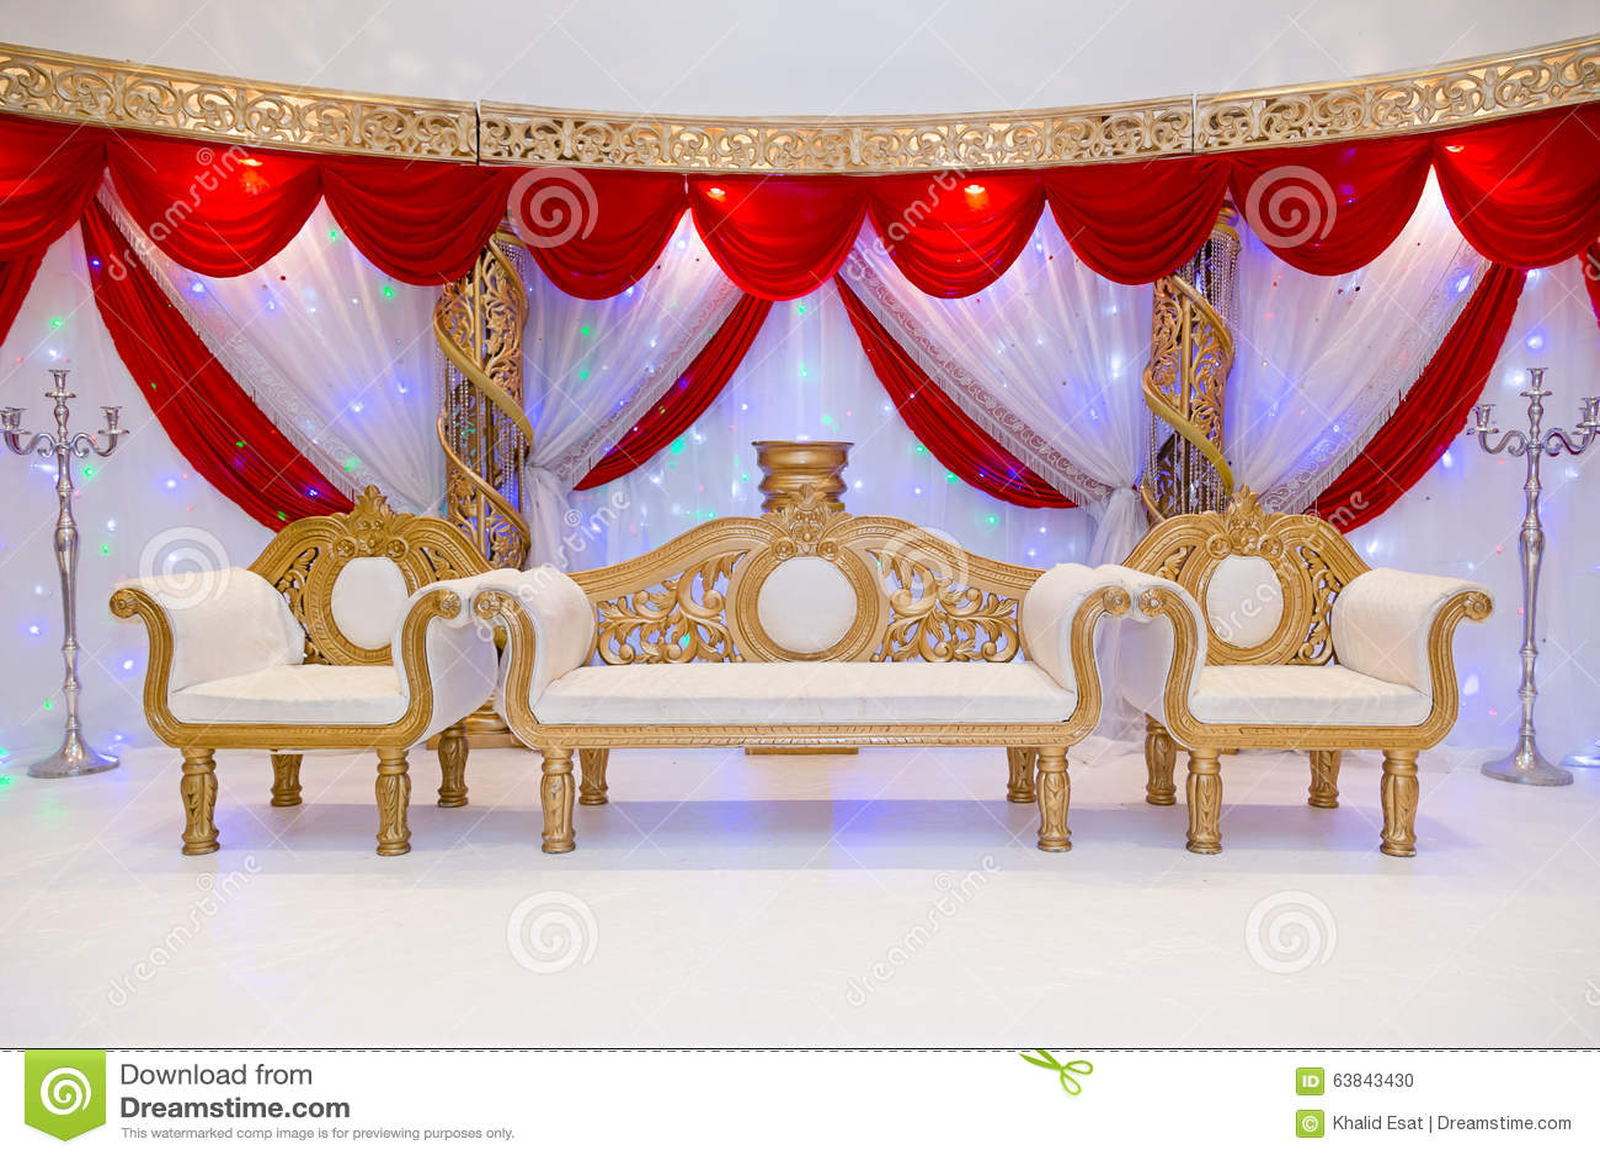 Mehndi Hd Wallpaper 1080p Wedding Stage Stock Photo Image Of Decor Culture